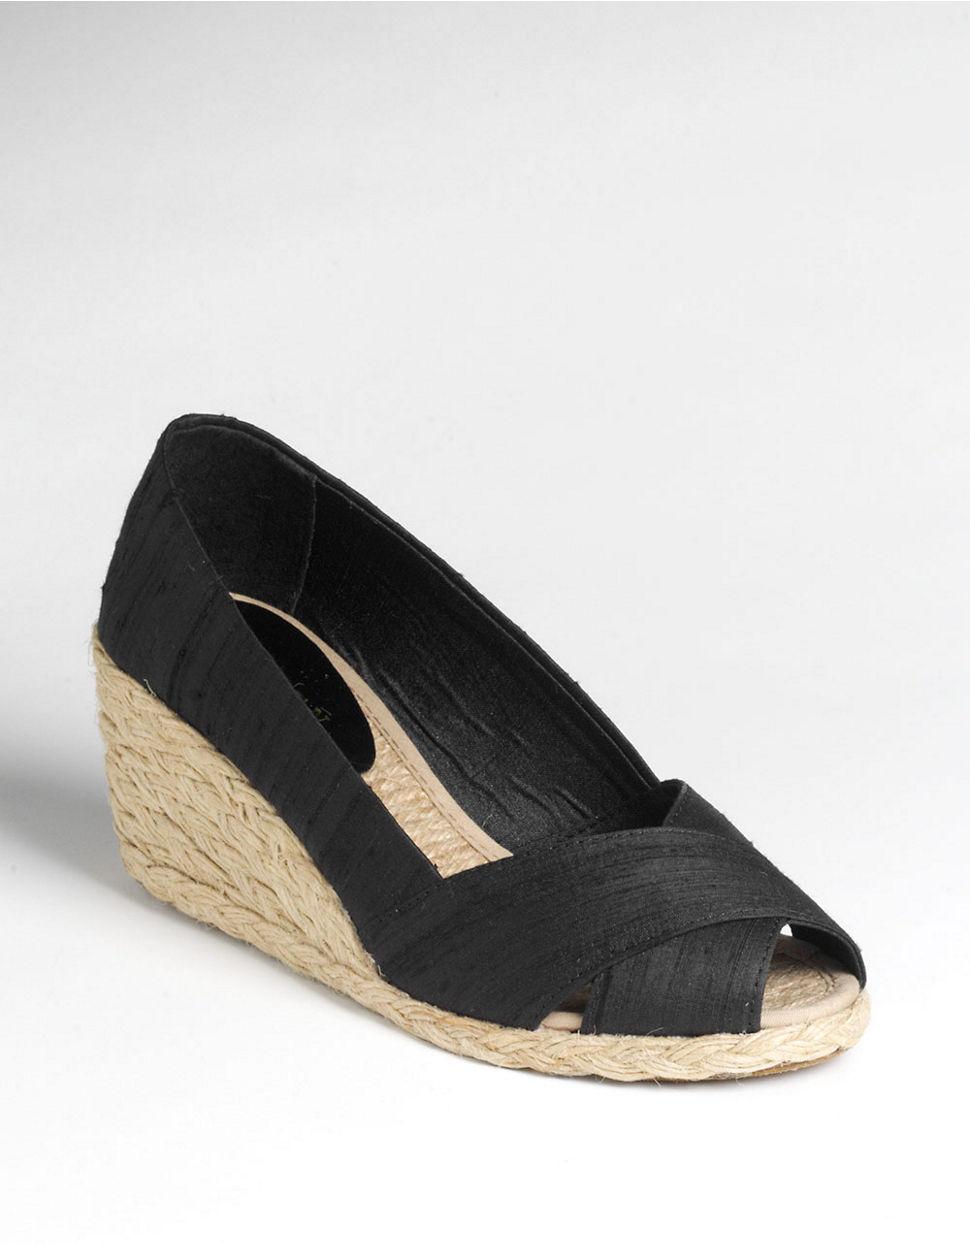 lauren by ralph lauren cecilia peep toe espadrilles in black lyst. Black Bedroom Furniture Sets. Home Design Ideas